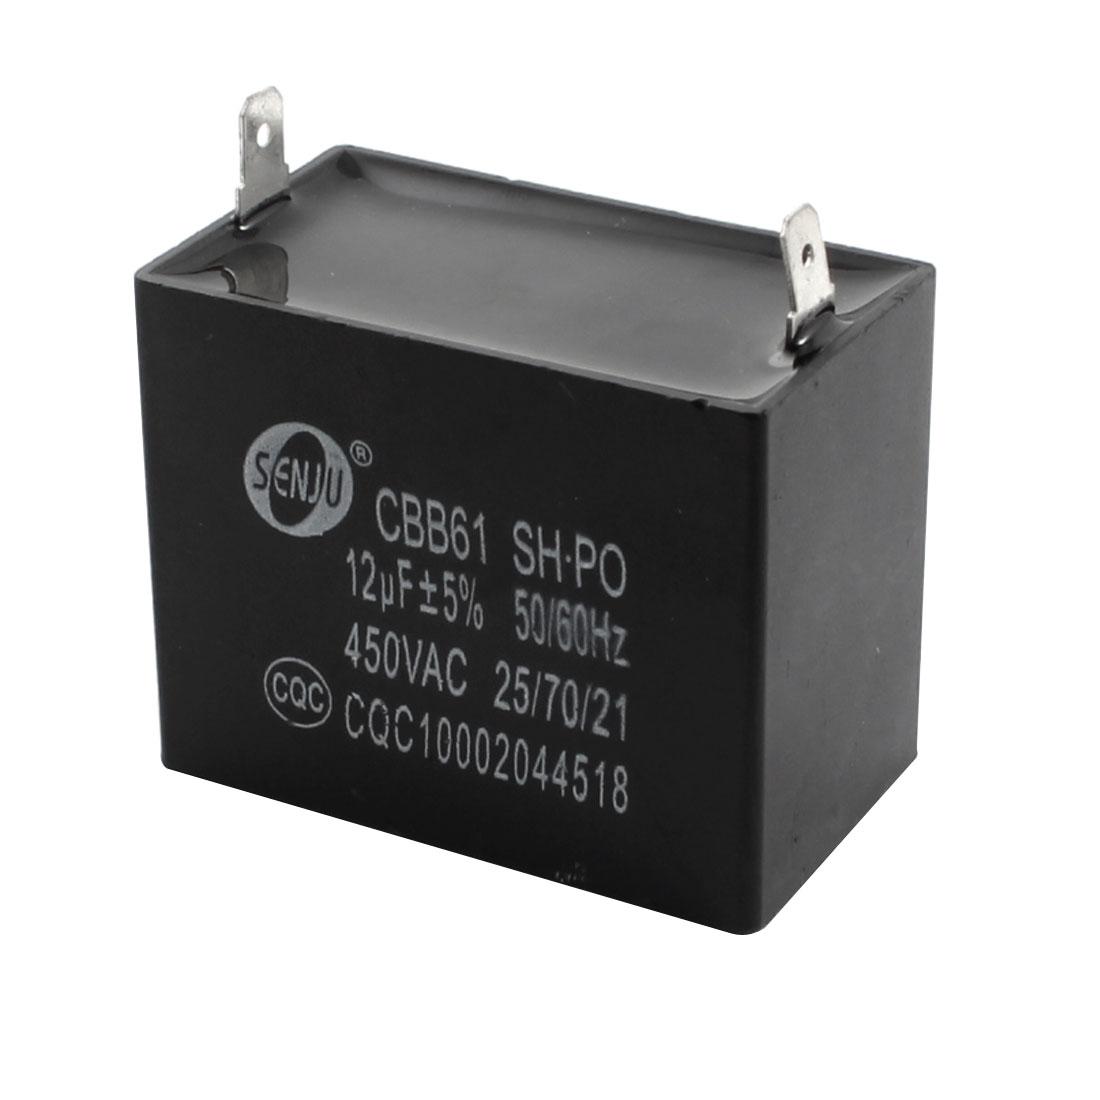 12uF 5% AC 450V Polypropylene Film Motor Running Capacitor CBB61